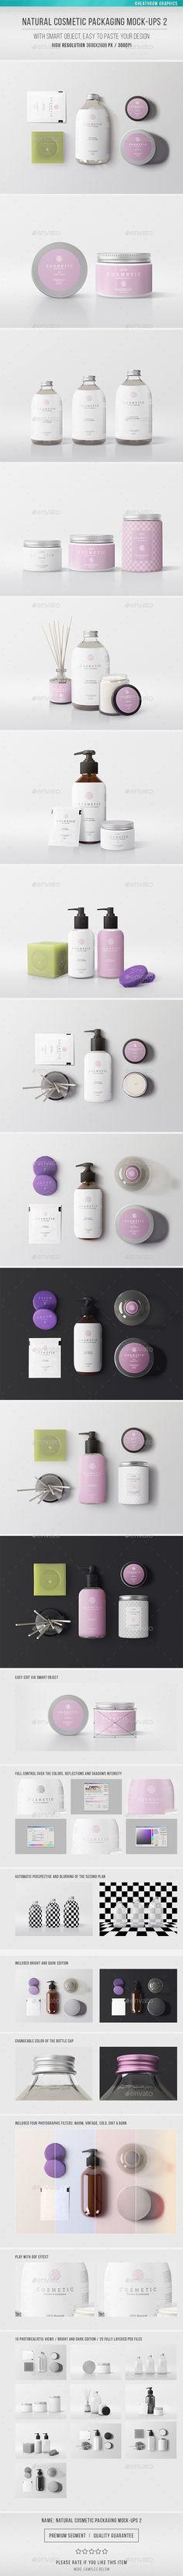 Natural Cosmetic Packaging Mock-Ups. Download here: https://graphicriver.net/item/natural-cosmetic-packaging-mockups-2/17337833?ref=ksioks